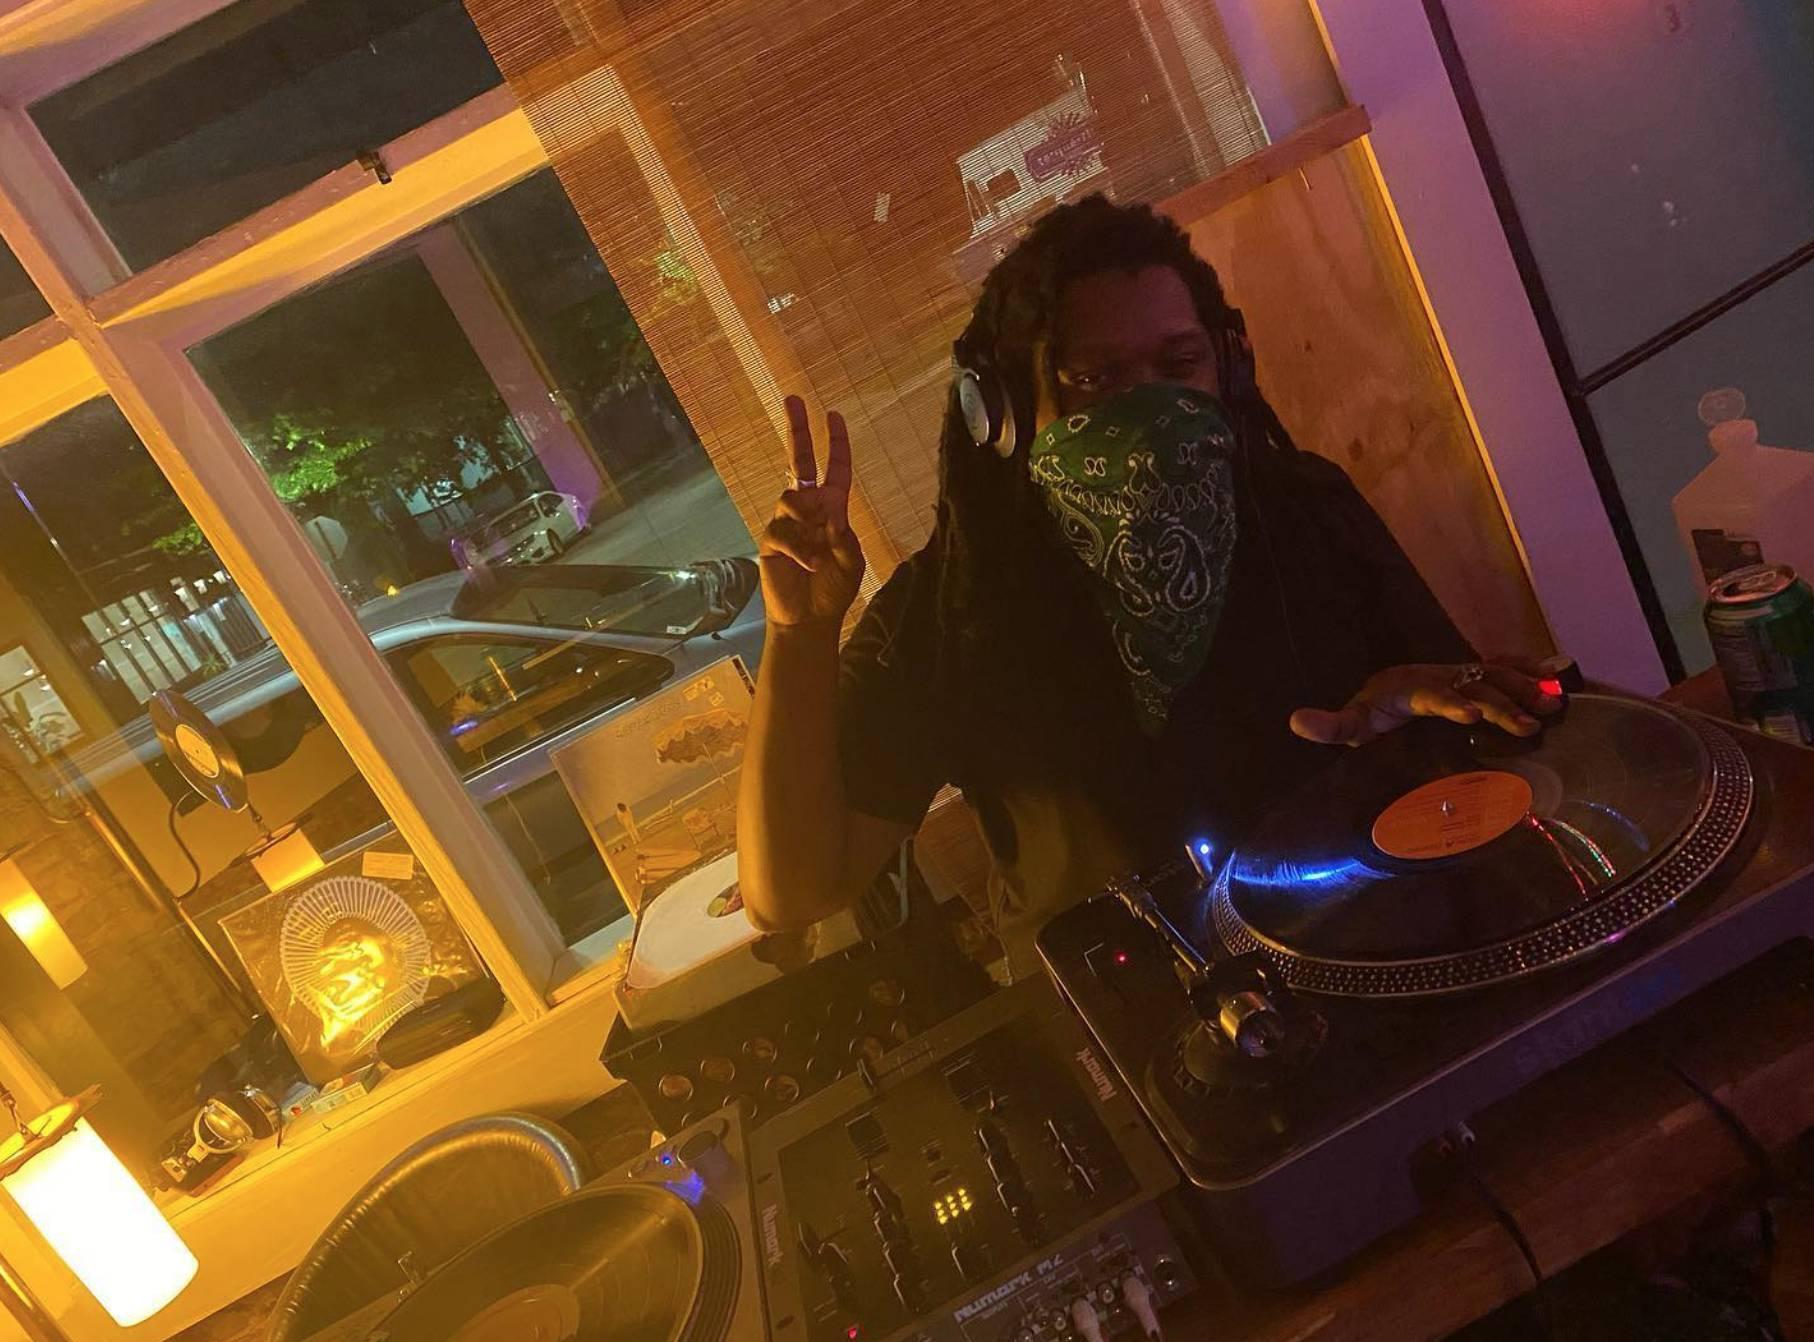 DJ Nicotene Zen